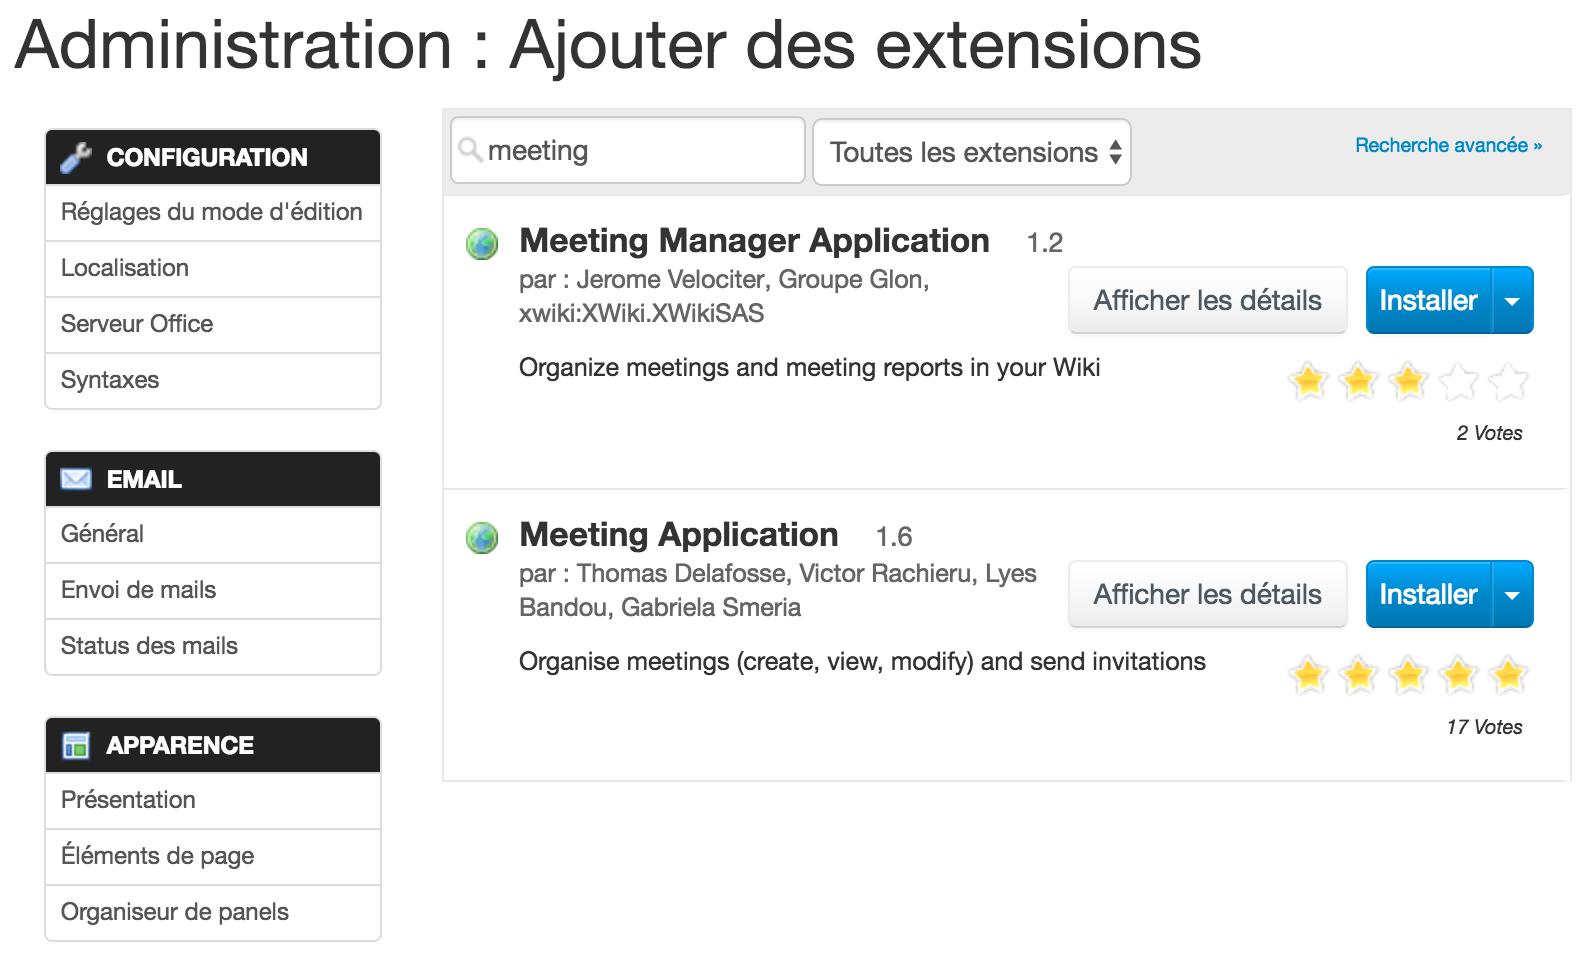 gestionnaire d'extensions.png